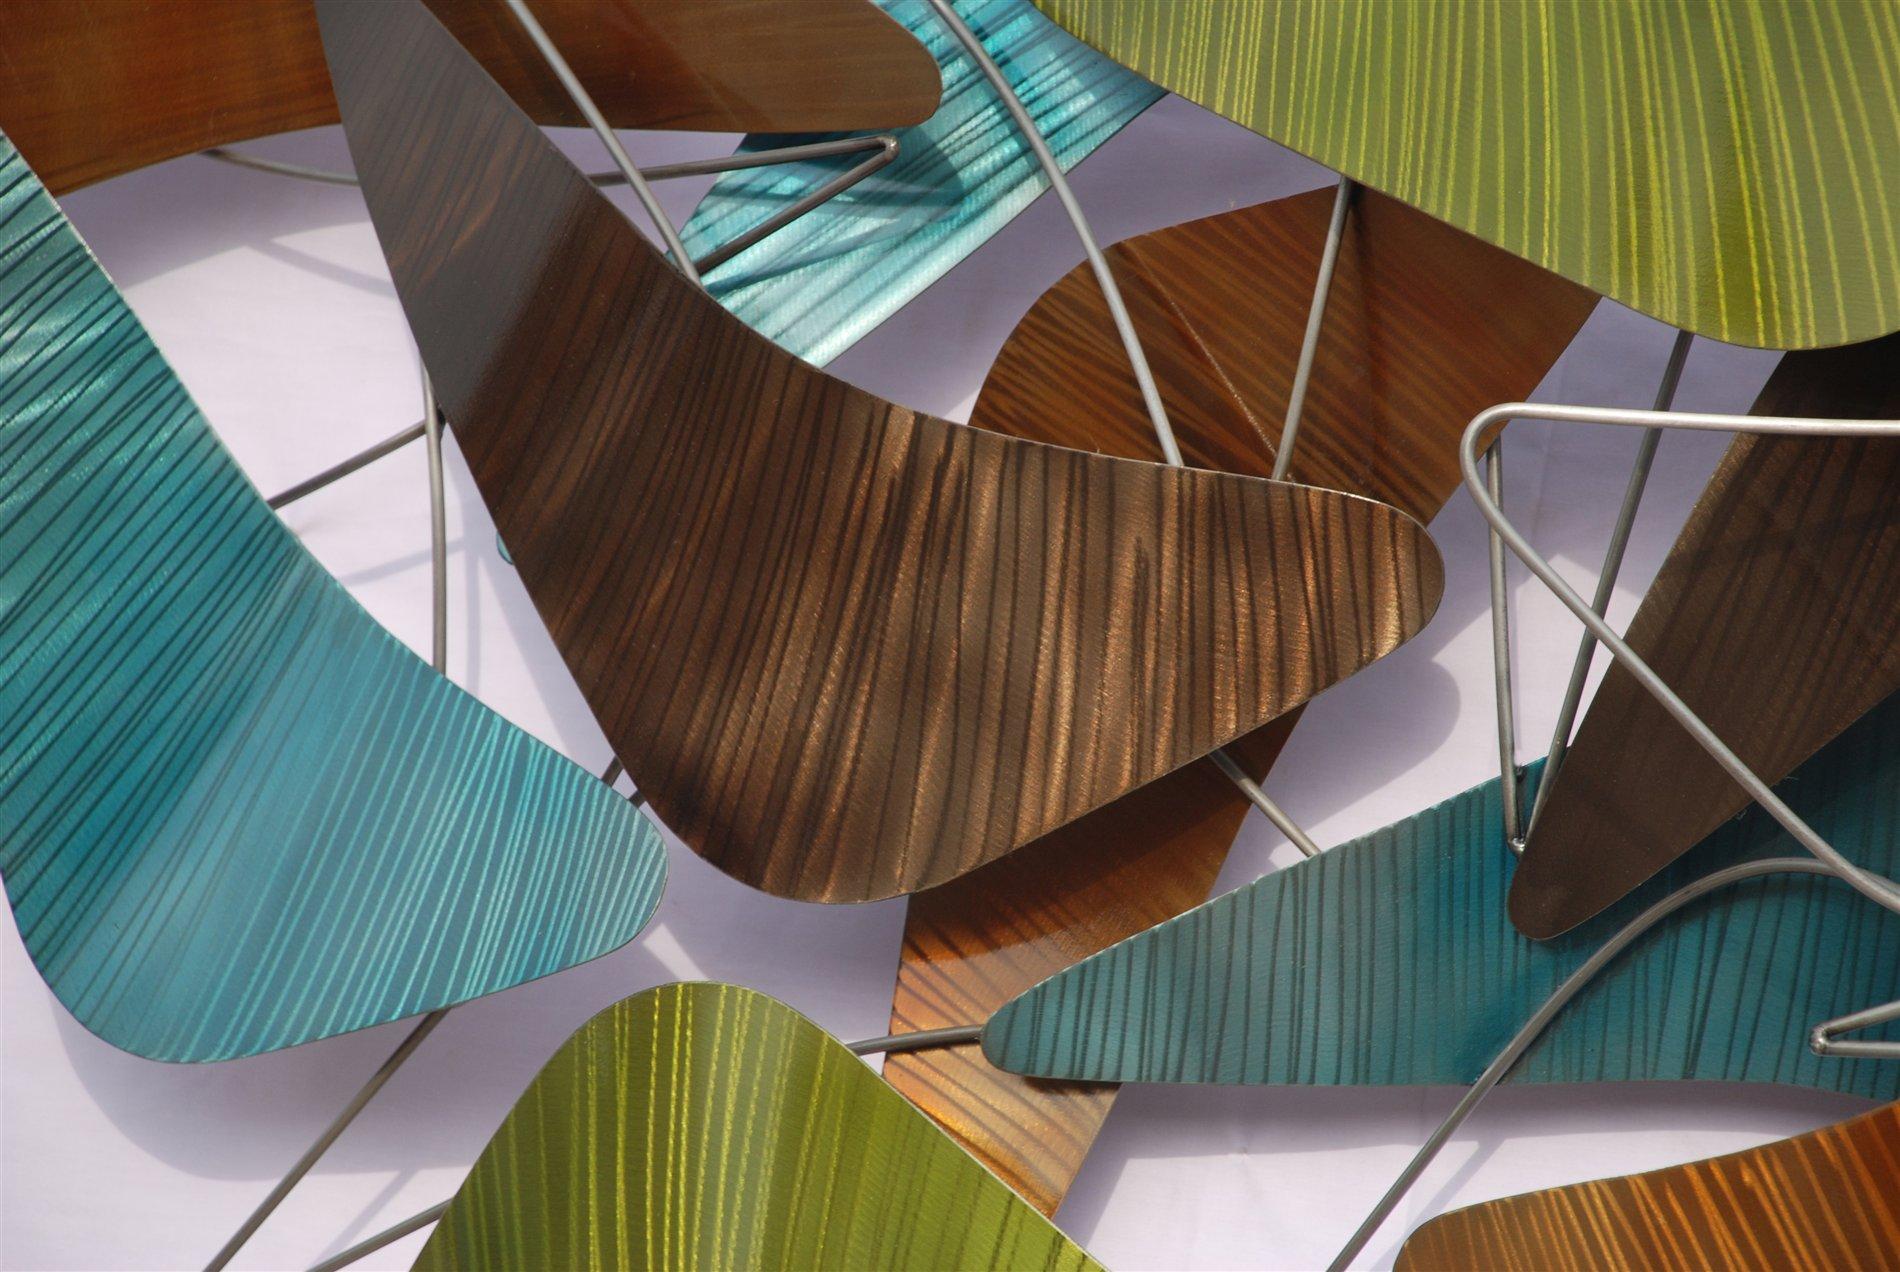 Nova Lighting 12529 Boomerang Contemporary Wall Art Wall Decor Nv 12529